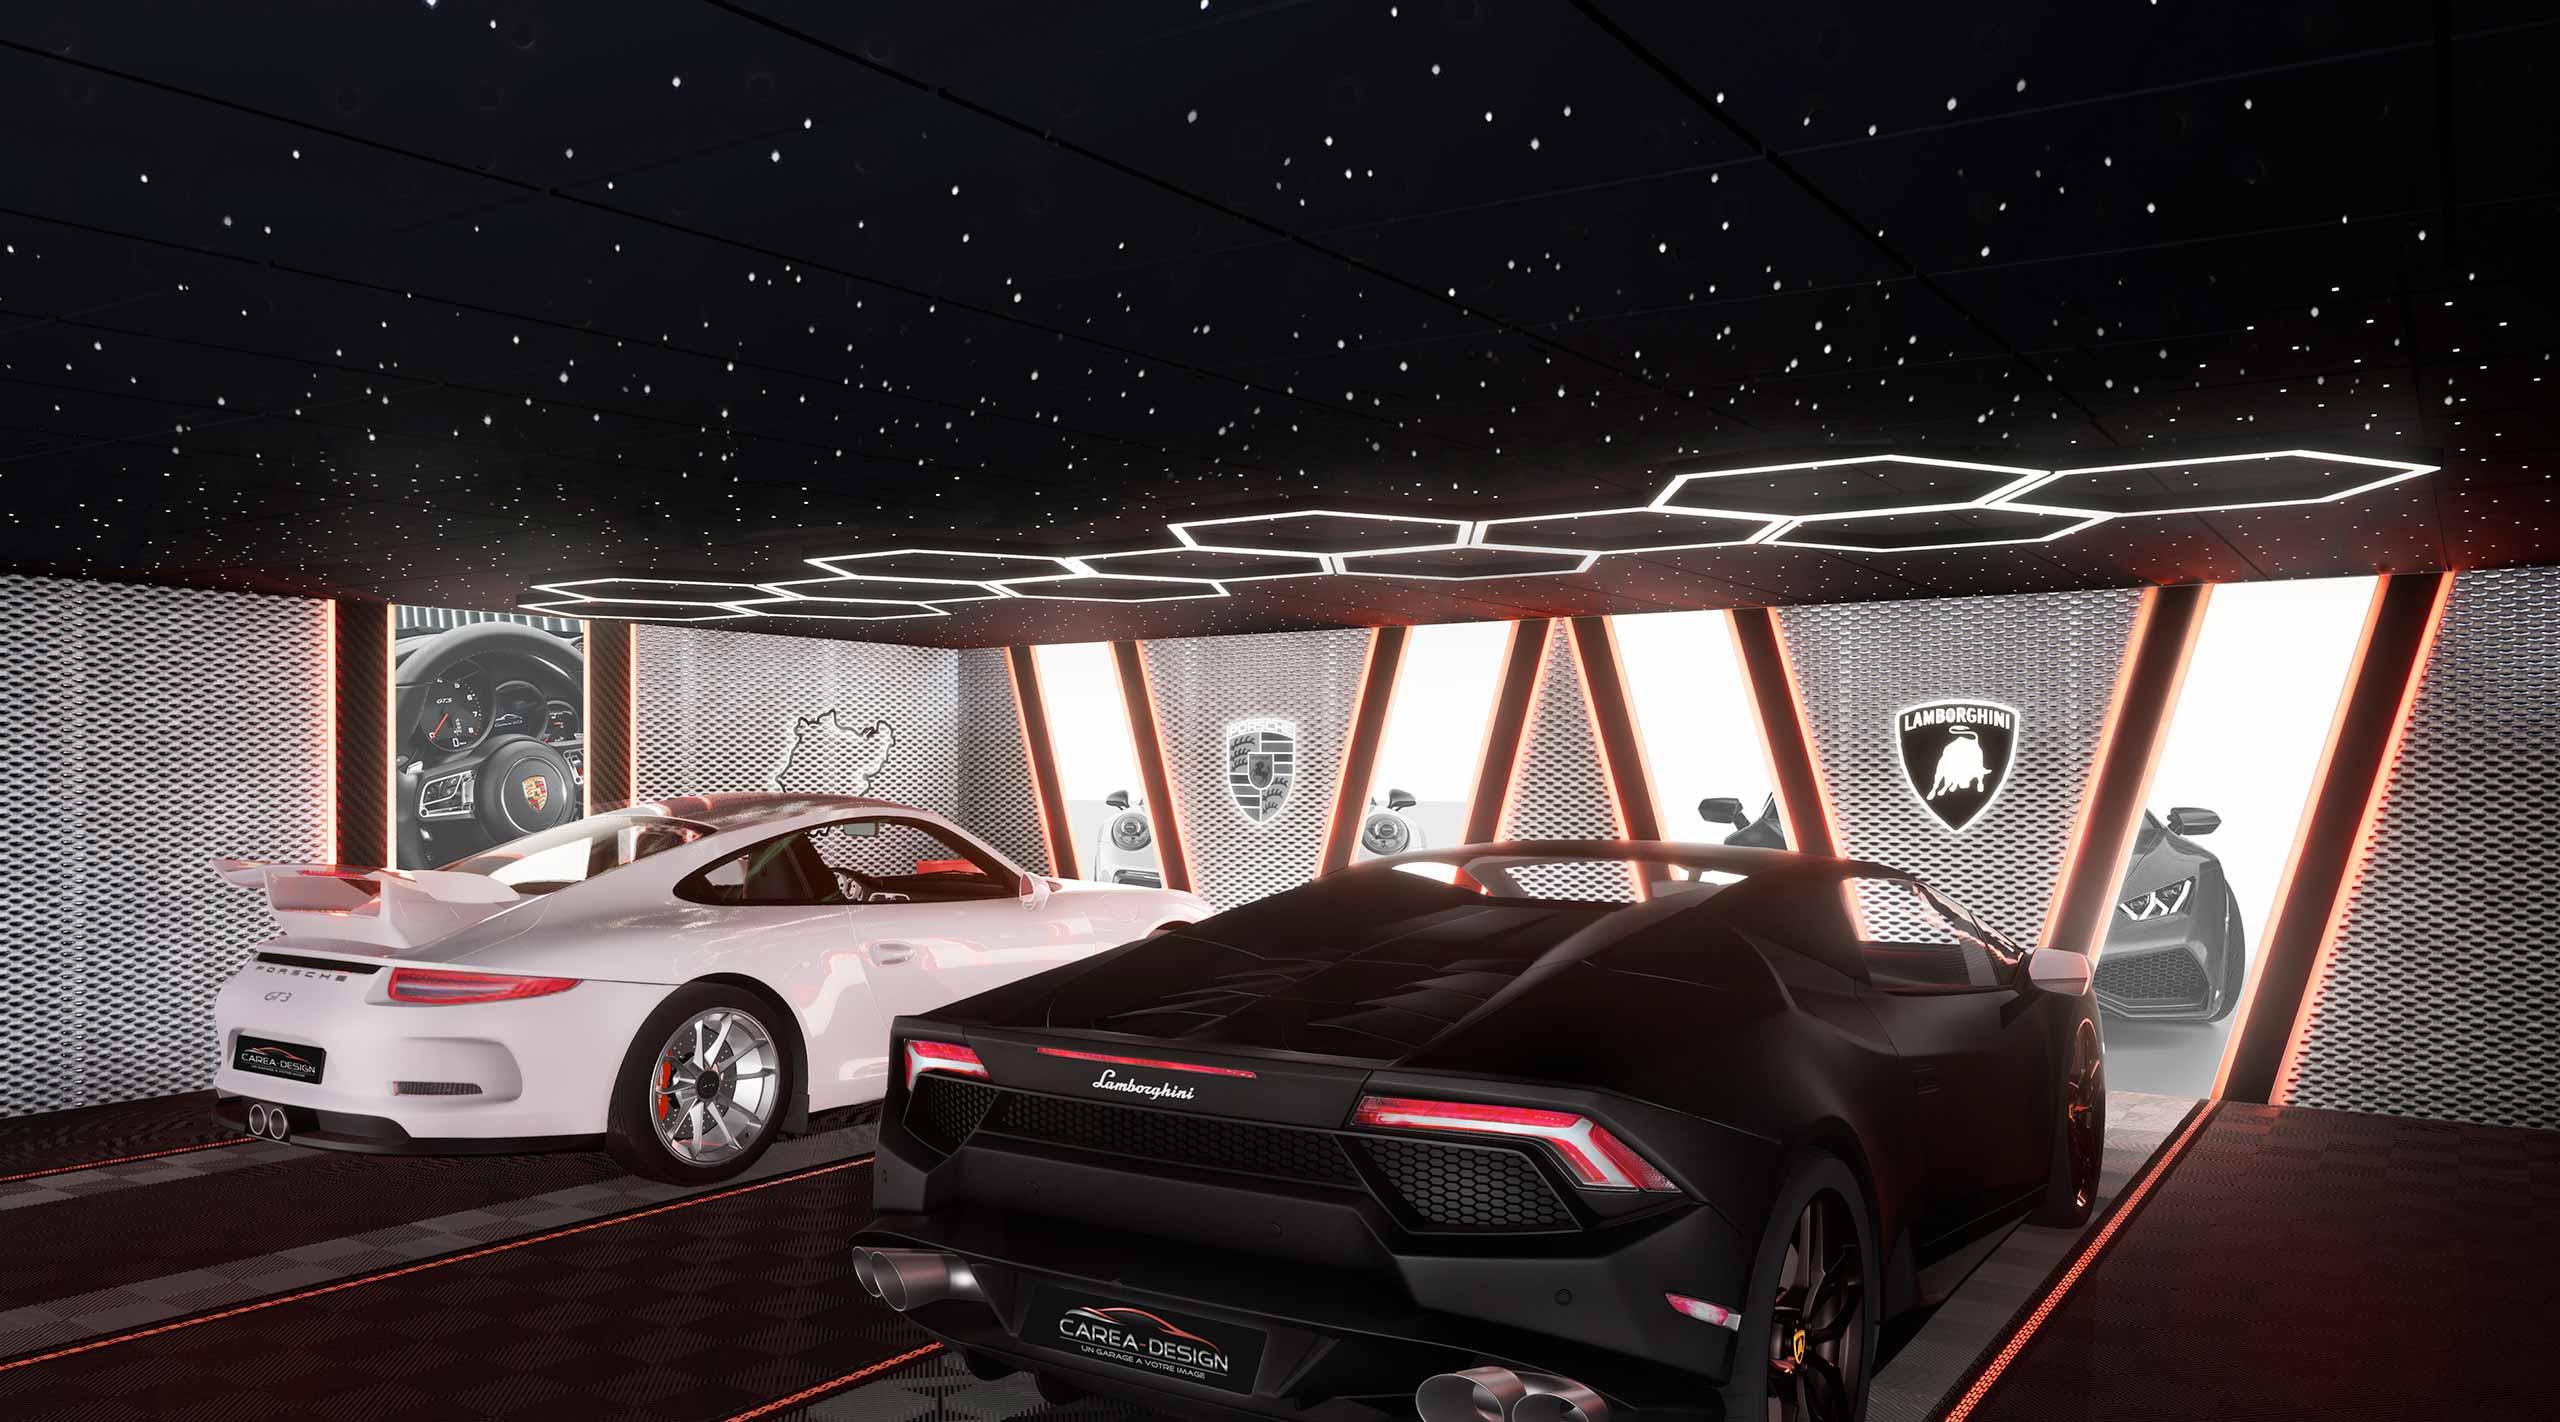 gamme dynamique aluminium 2 Carea Design